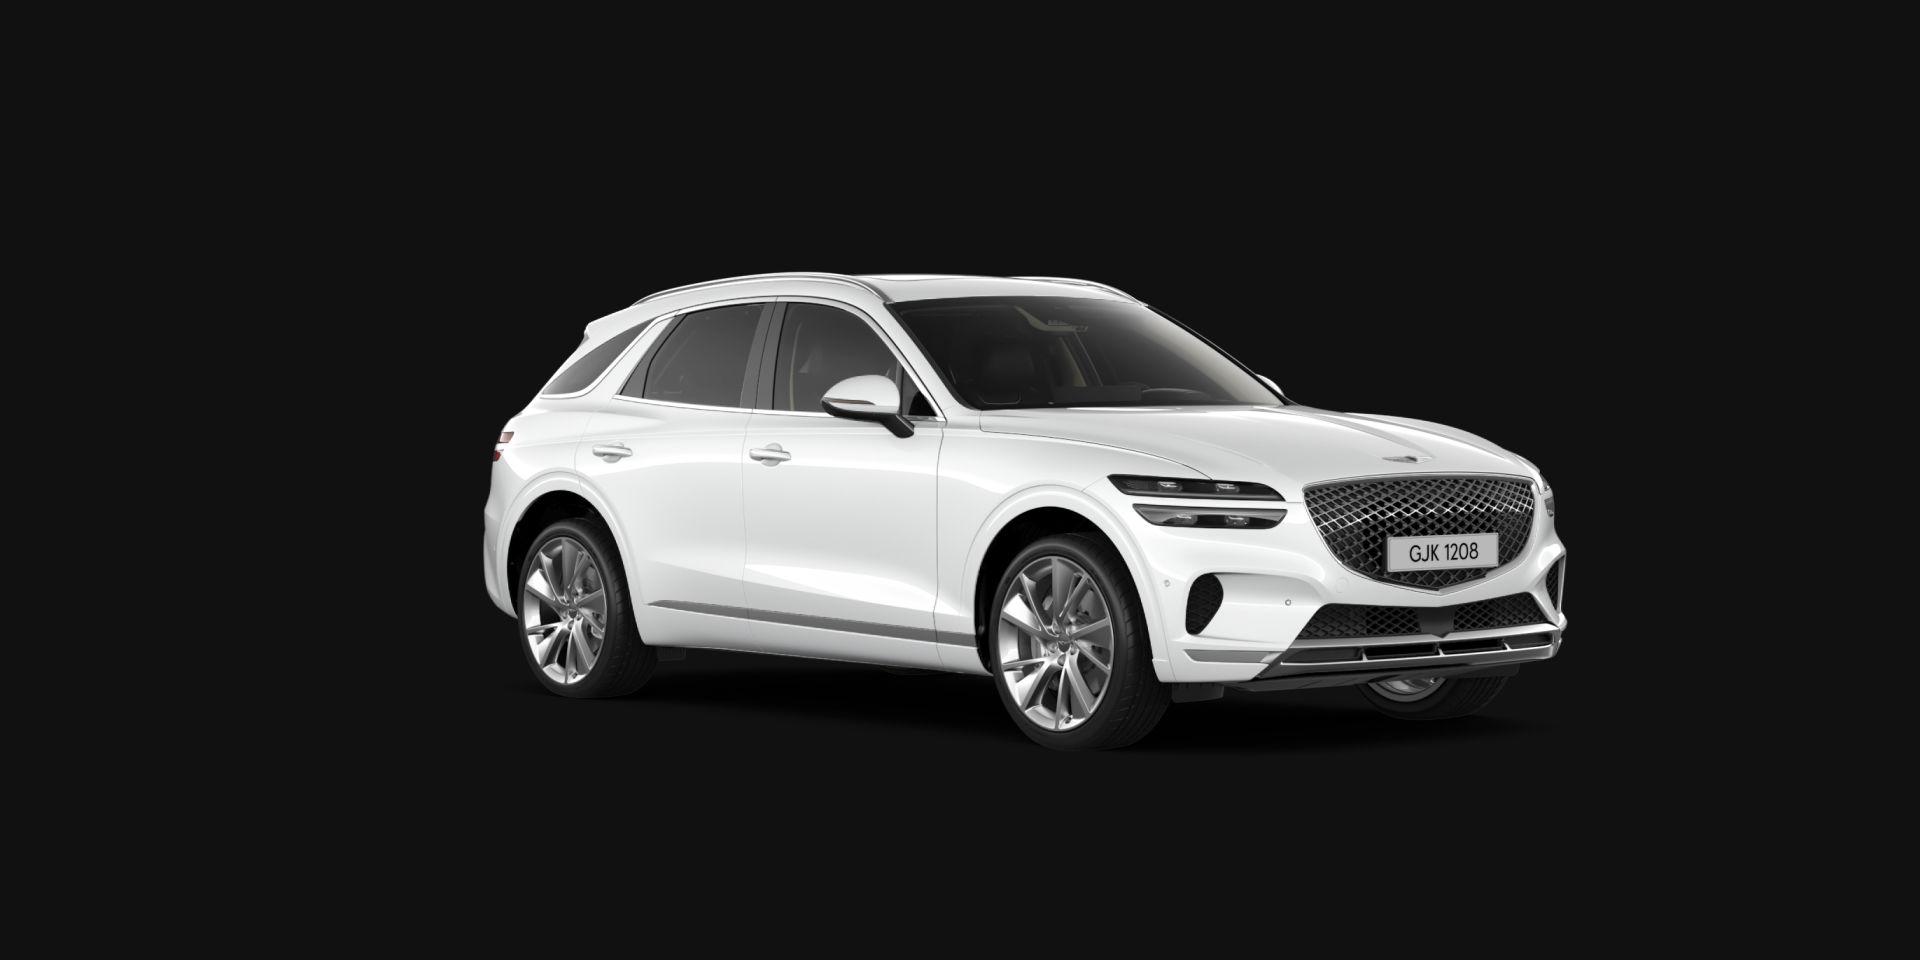 GENESIS GV70 - Luxury mid SUV Design | GENESIS Worldwide